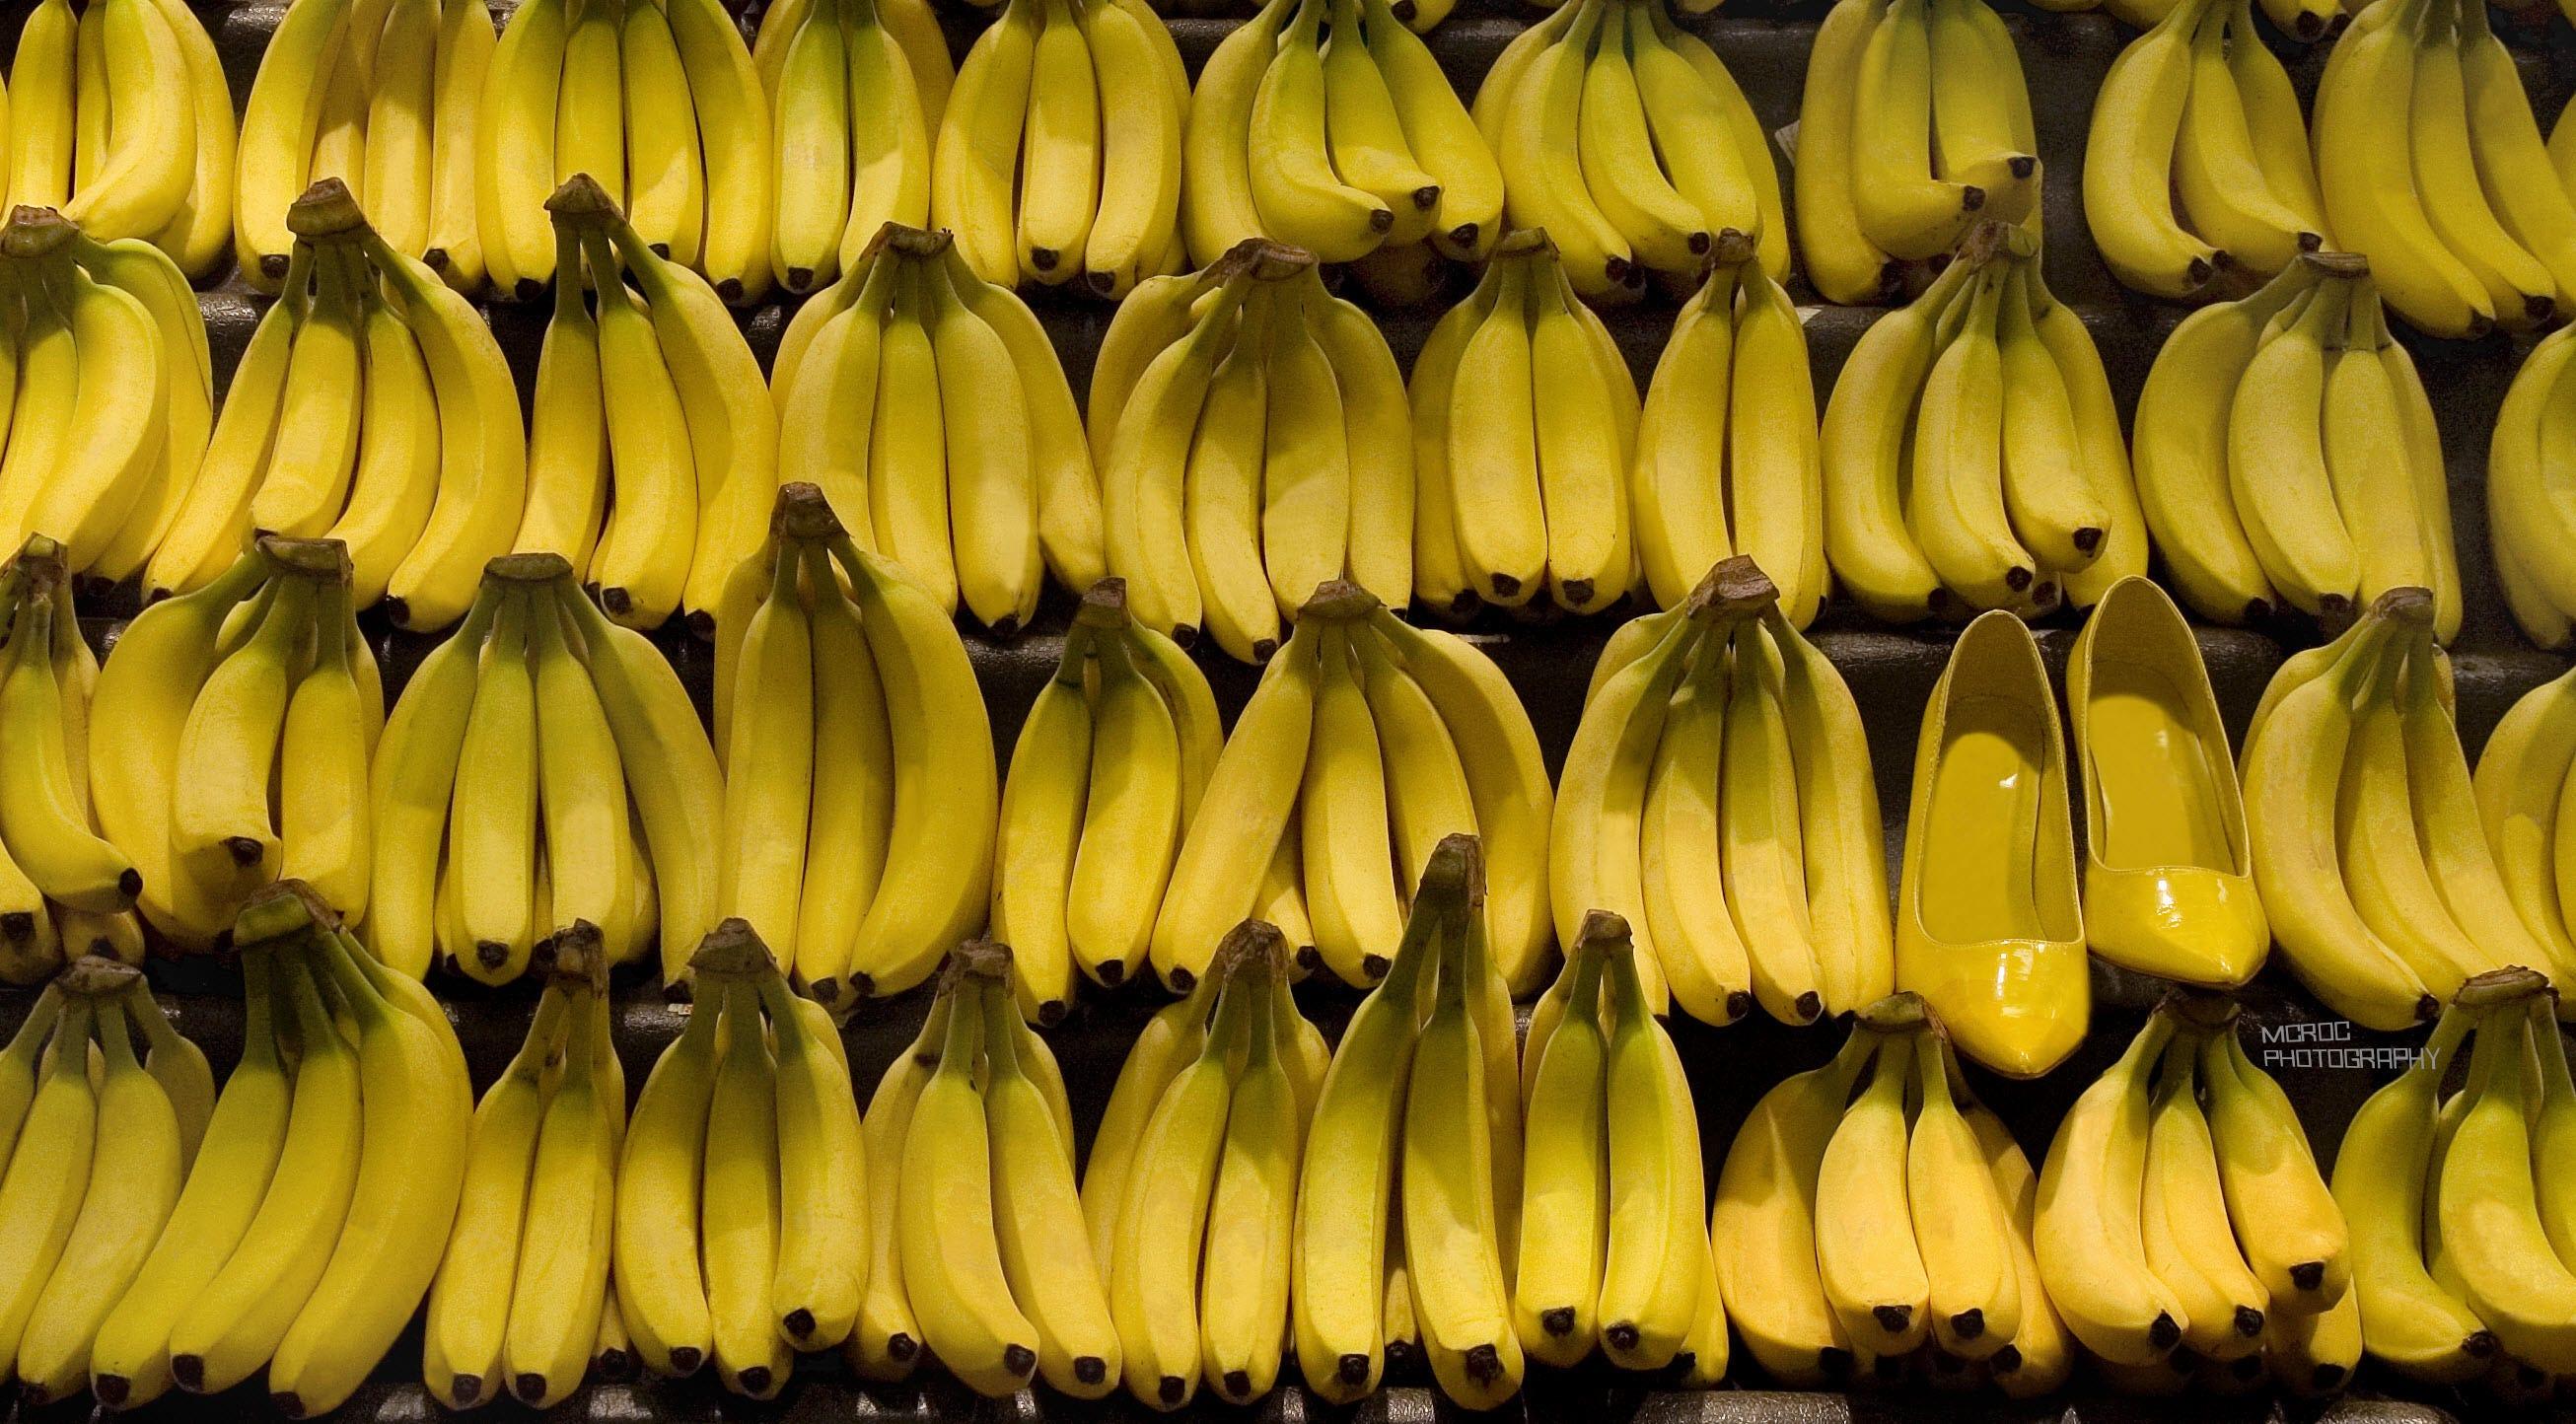 Fun Fashion Food Image Bananas Hidden Shoes Bright Yellow | Etsy